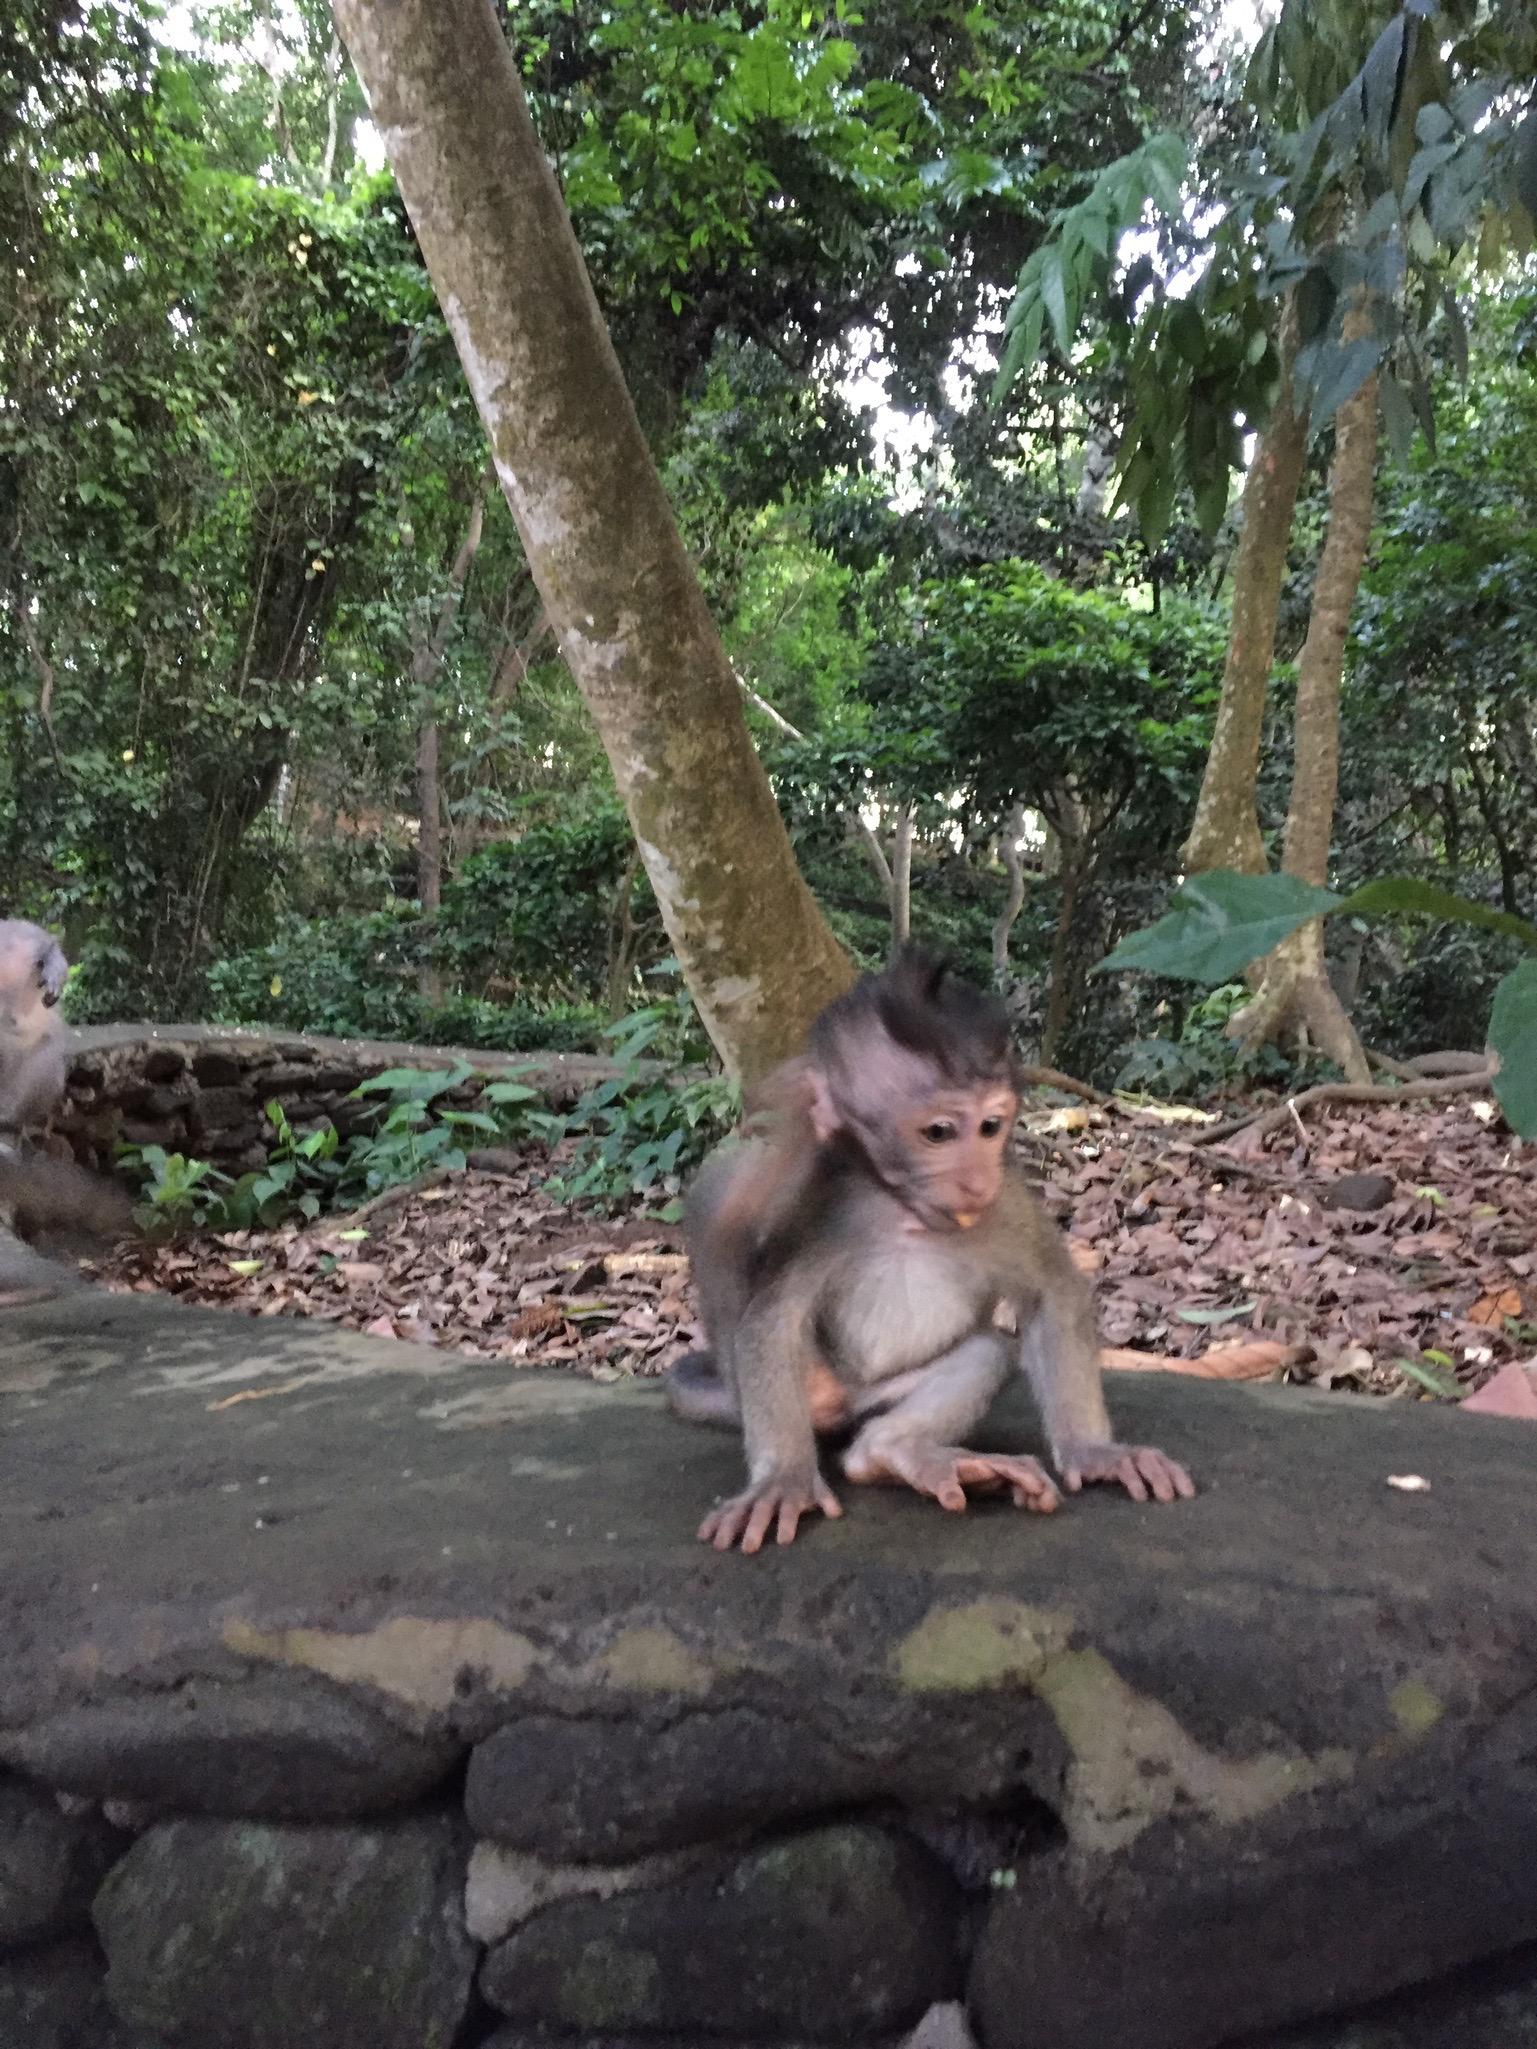 Baby monkey at the Monkey Forest in Ubud, Bali.